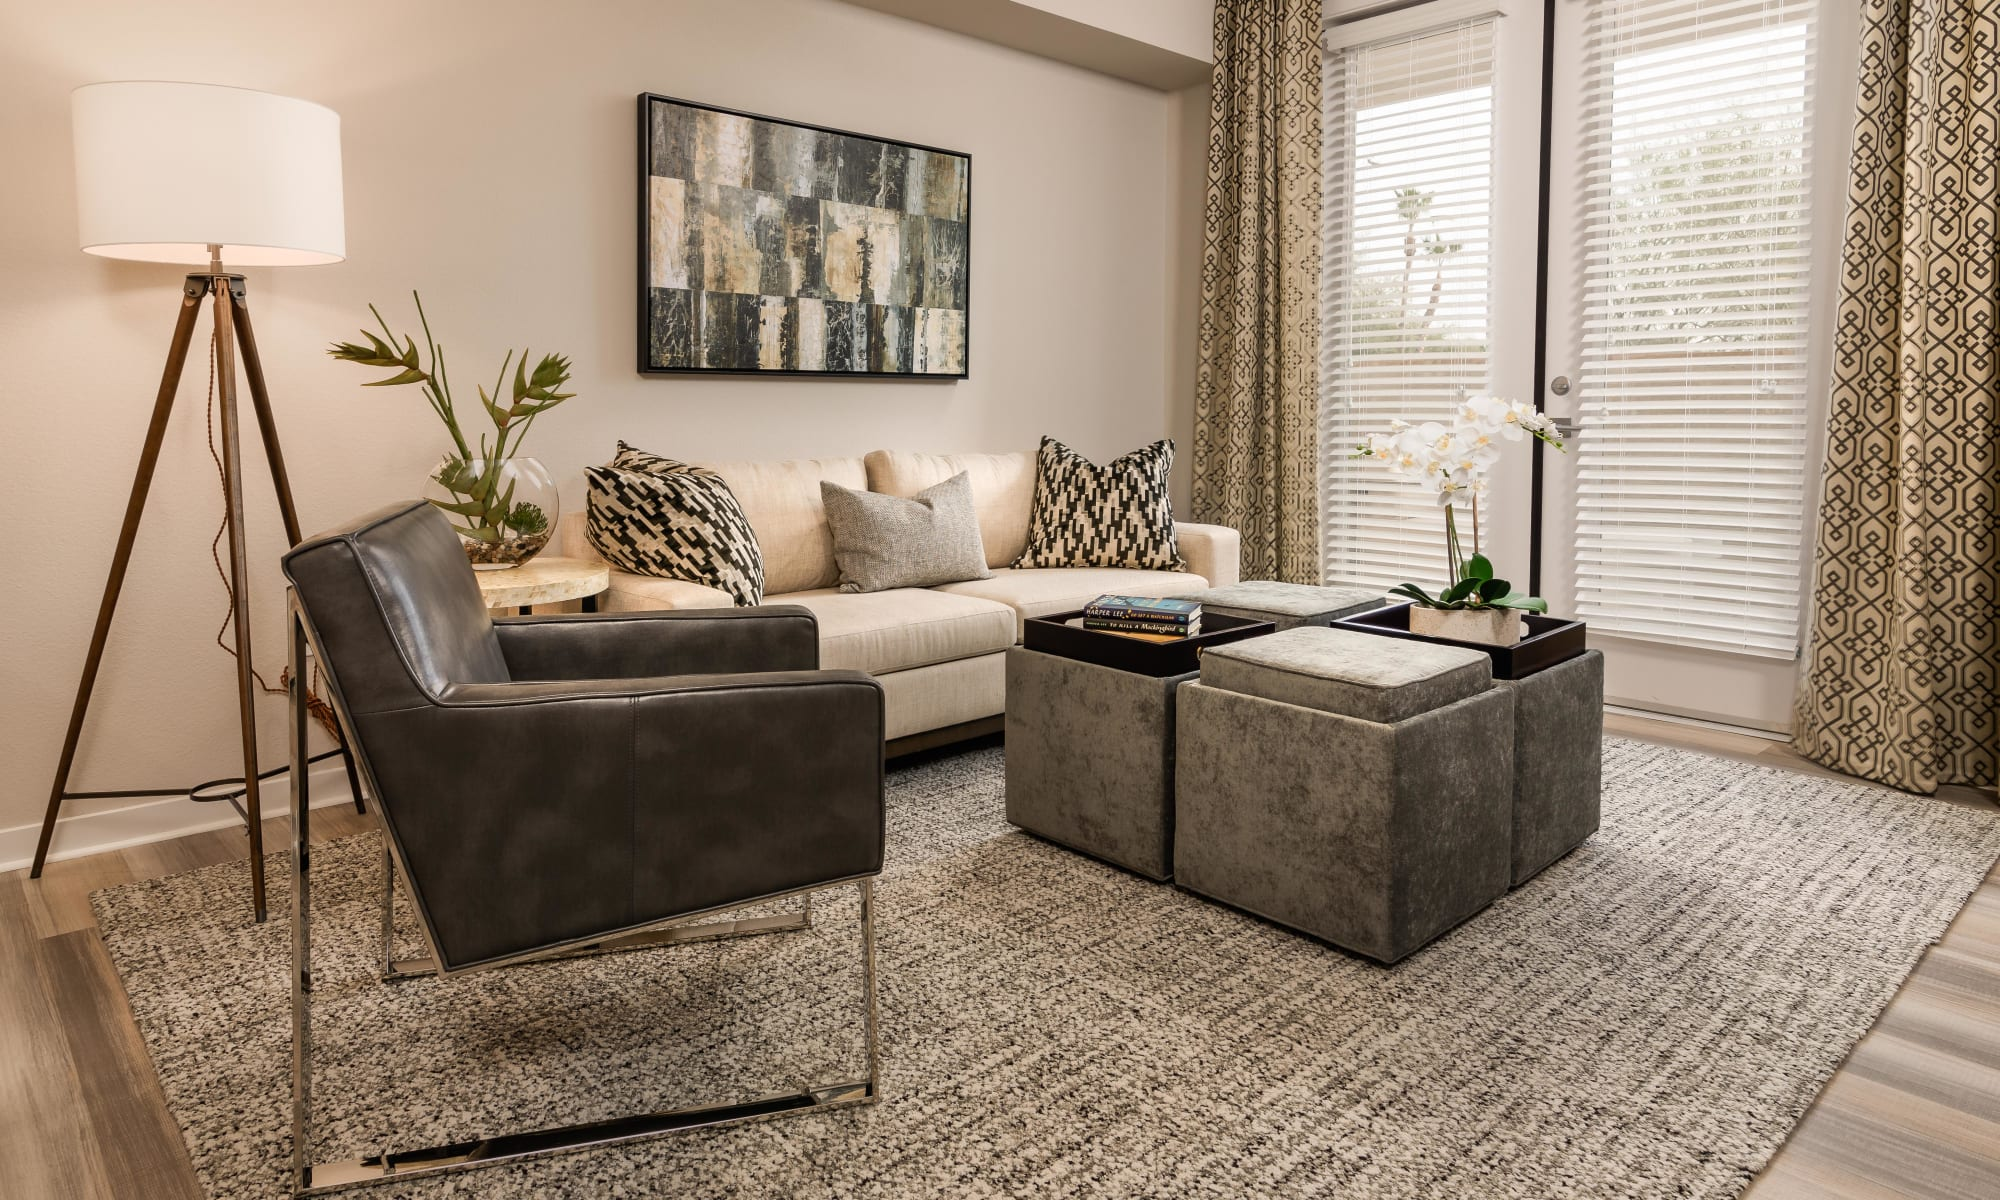 Apartments at Morrison Chandler in Chandler, Arizona